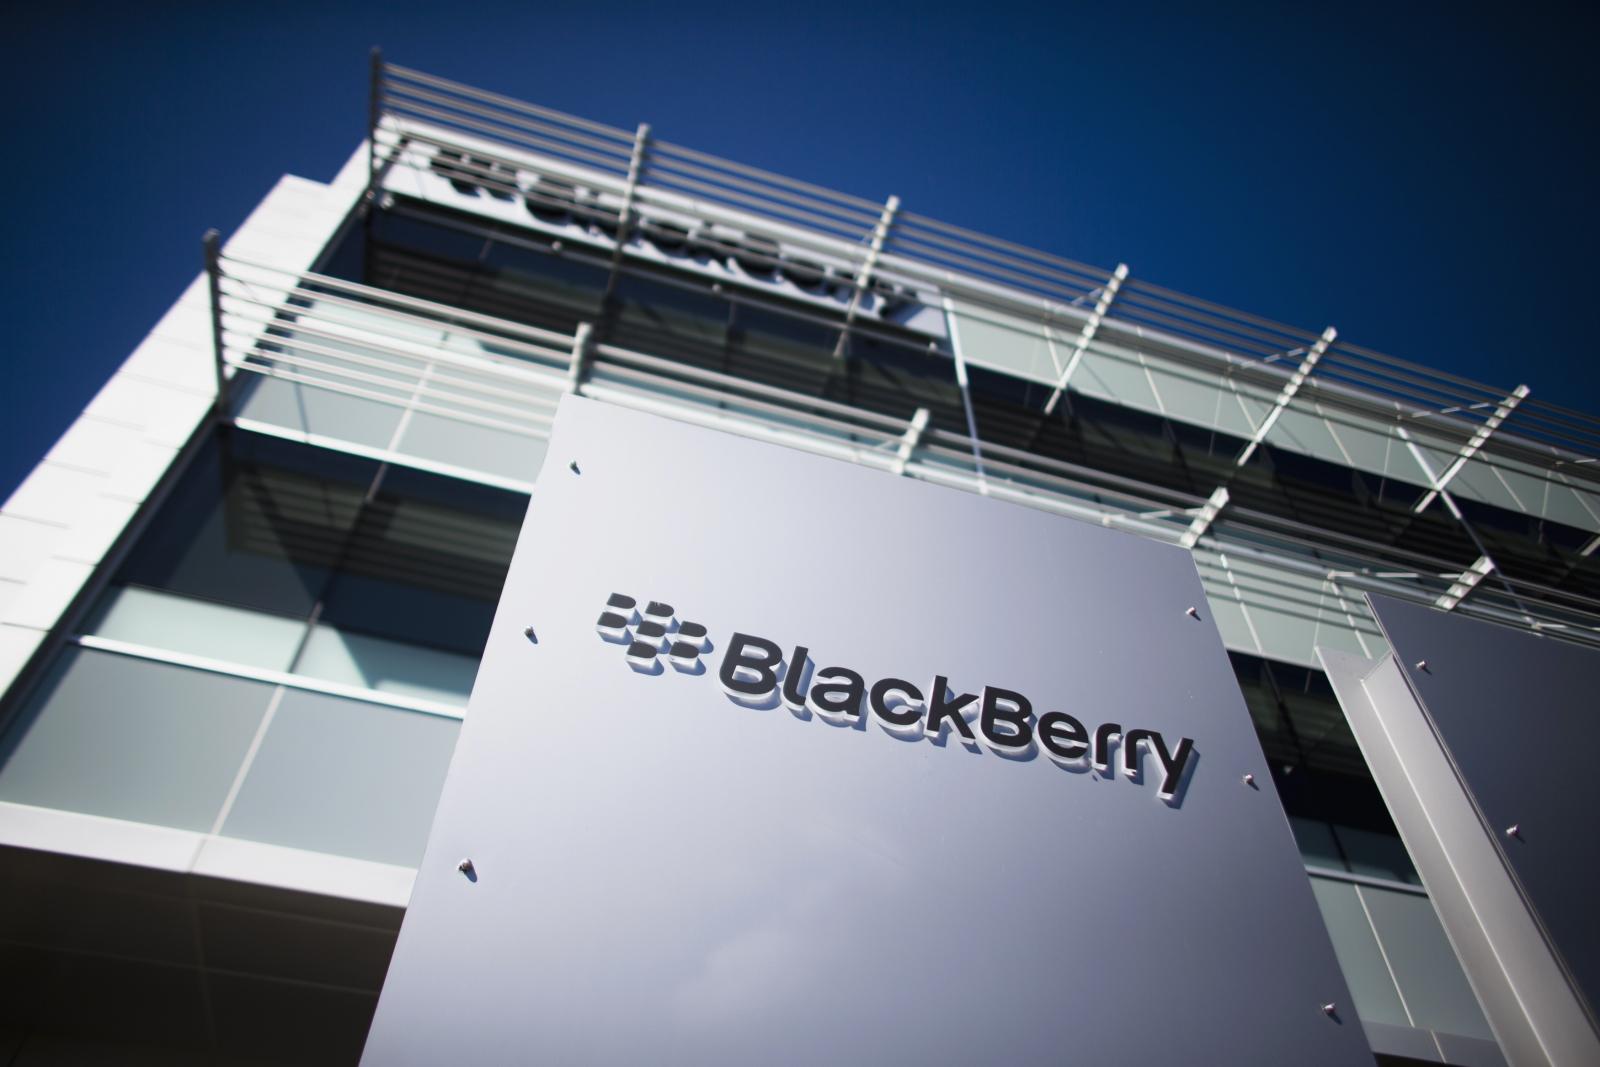 BlackBerry developing anti-hack tool for car